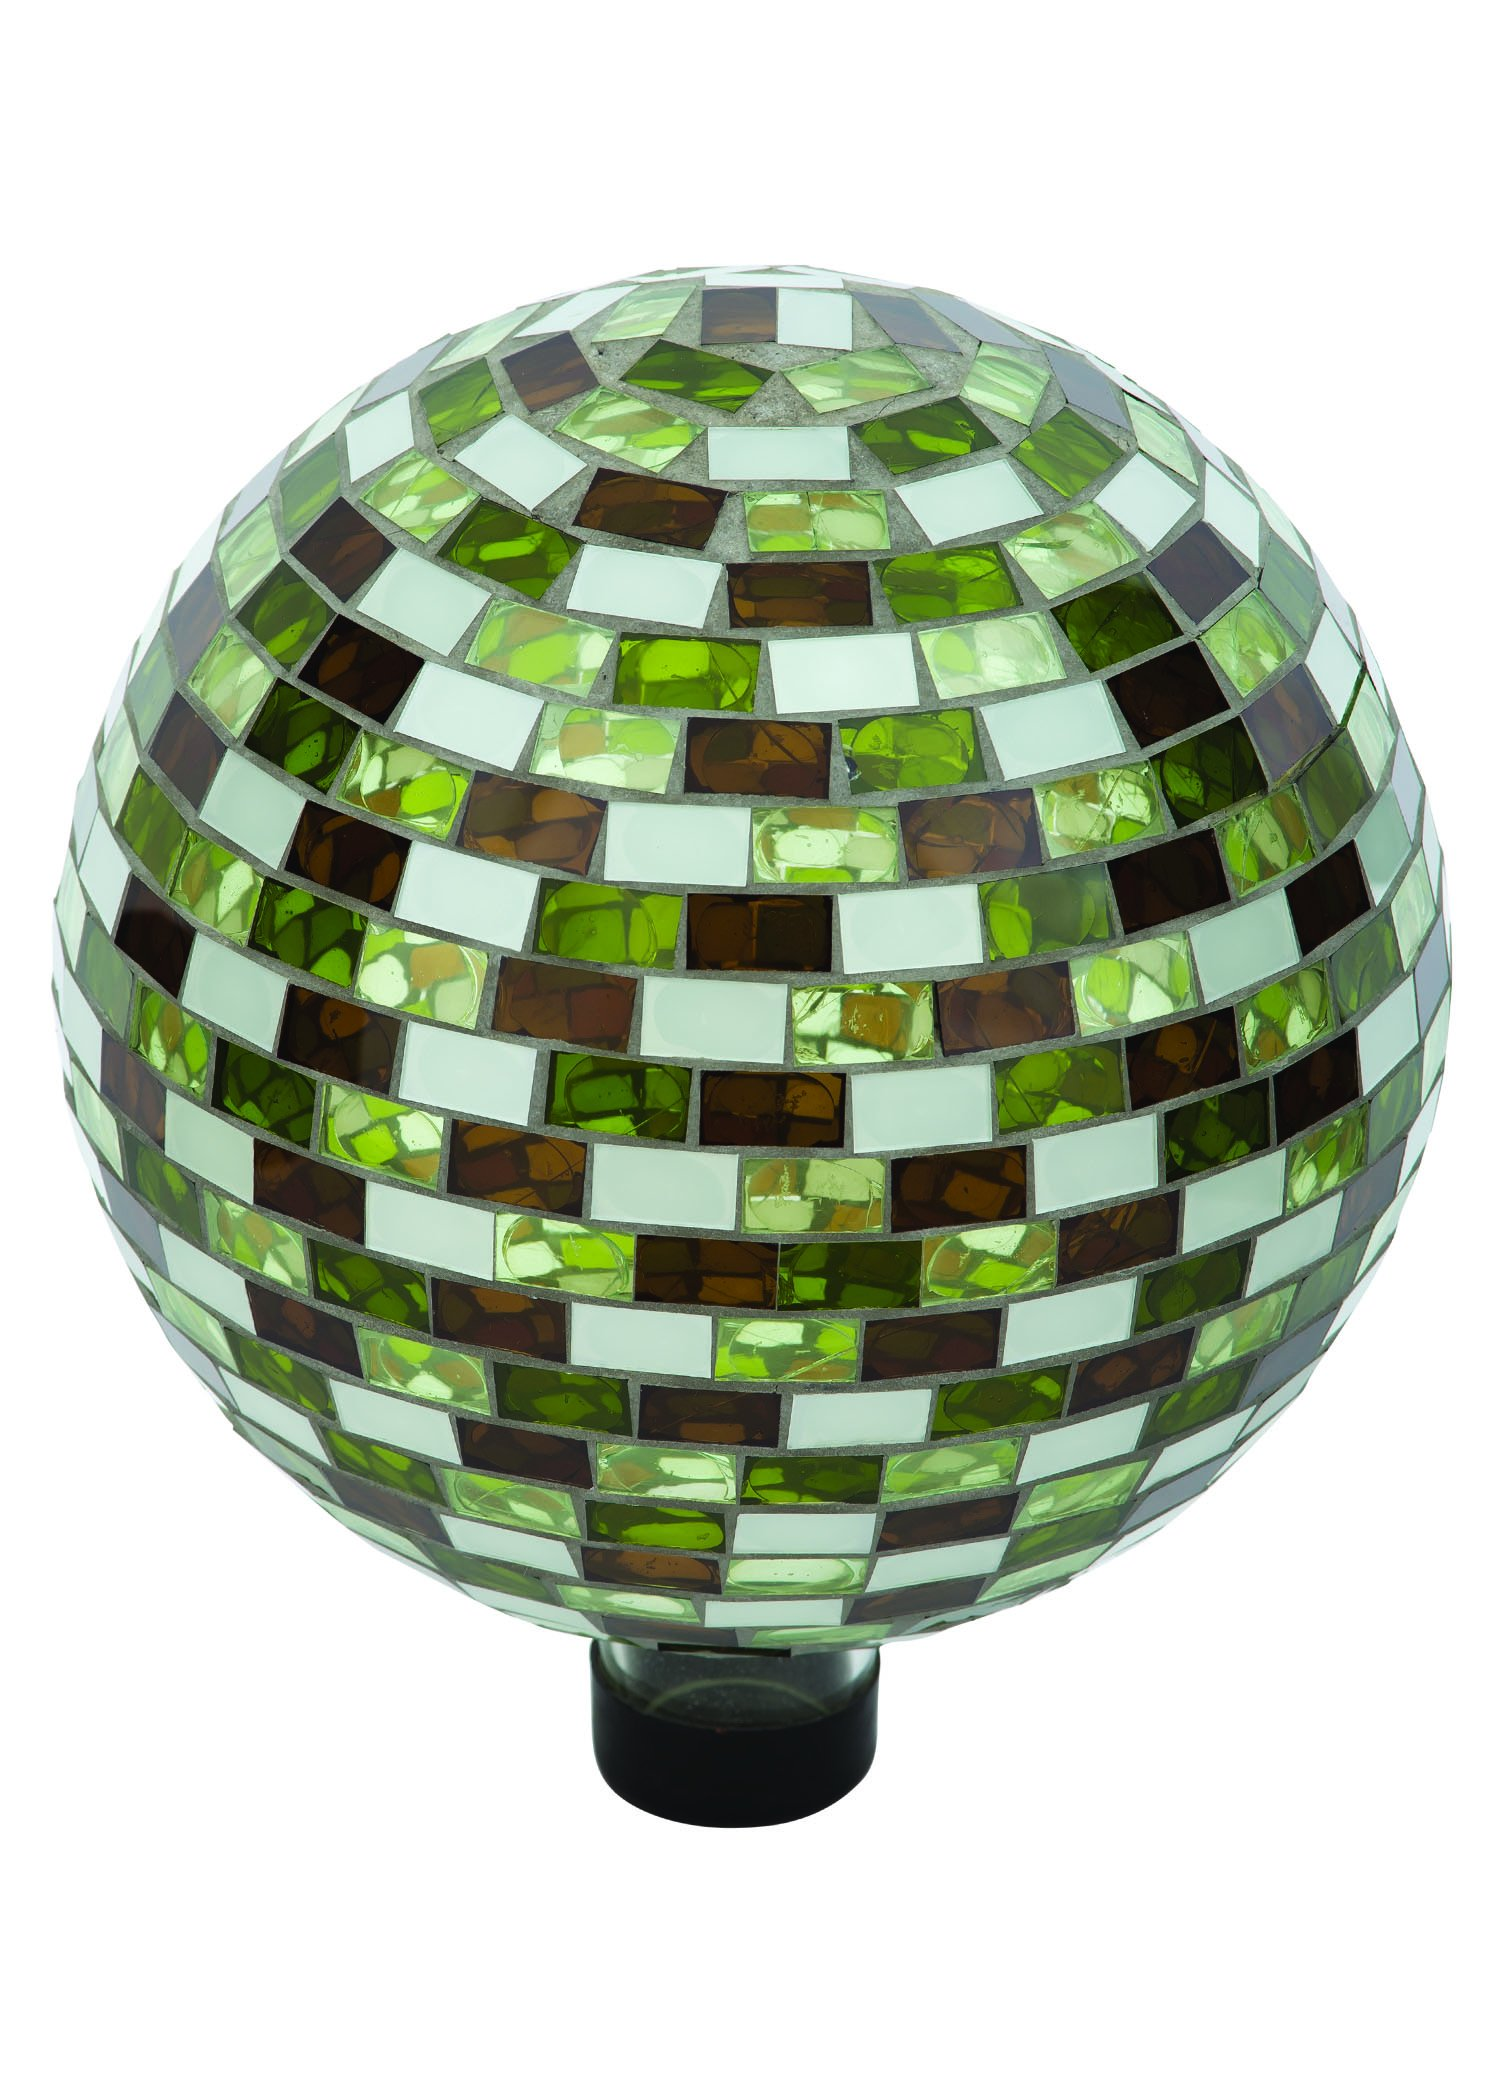 Russco III GD137173 Glass Gazing Ball, 10'', Mosaic Rectangle by Russco III